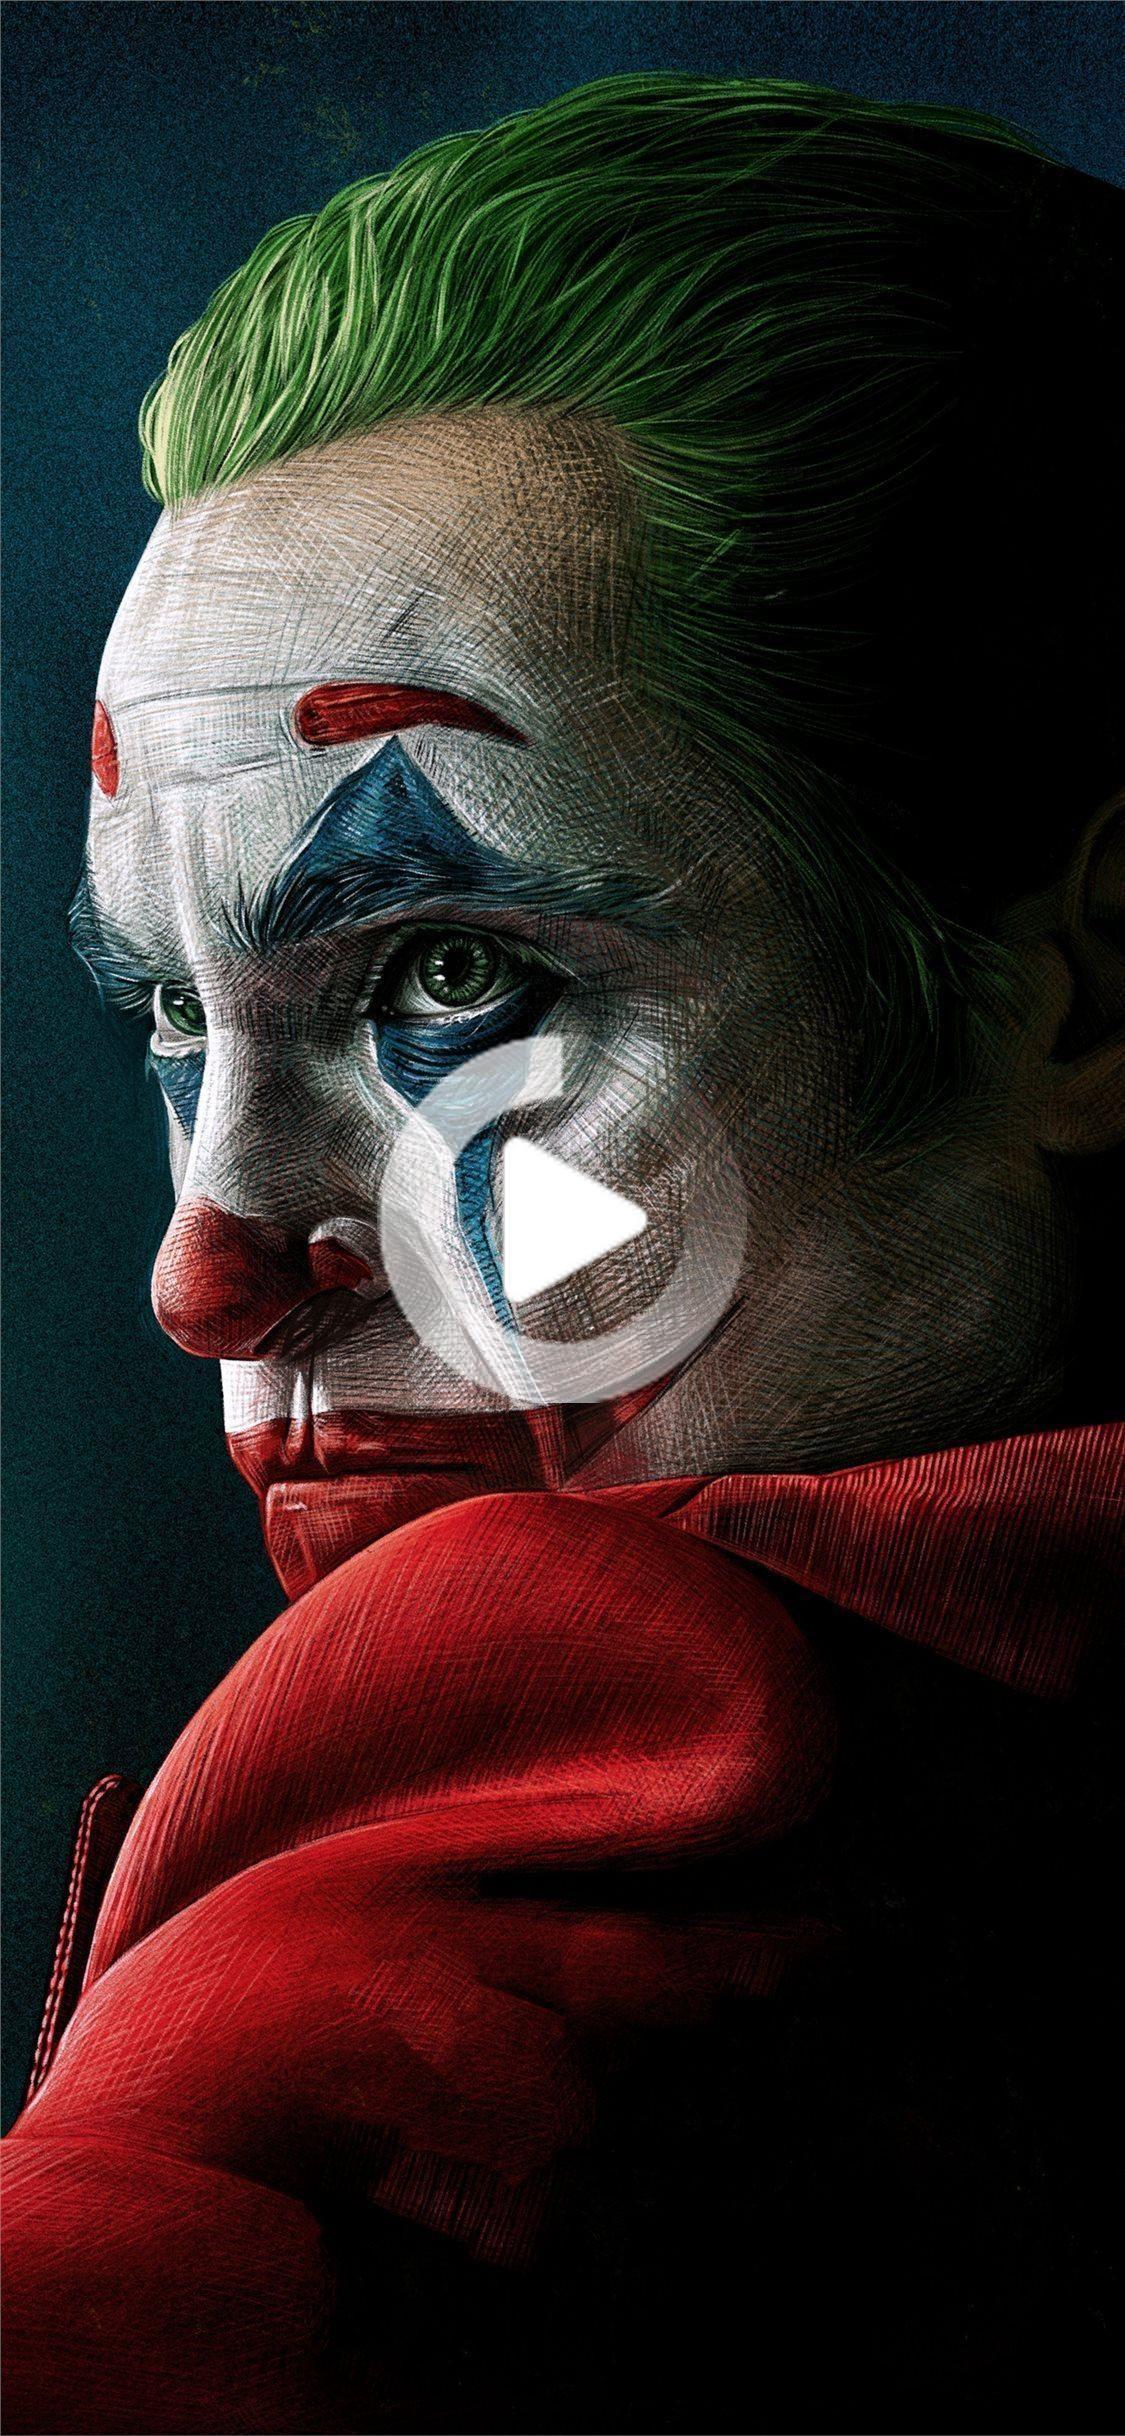 Joker 4k tapety pro iPhone 11 Pro Max in 2020 Live